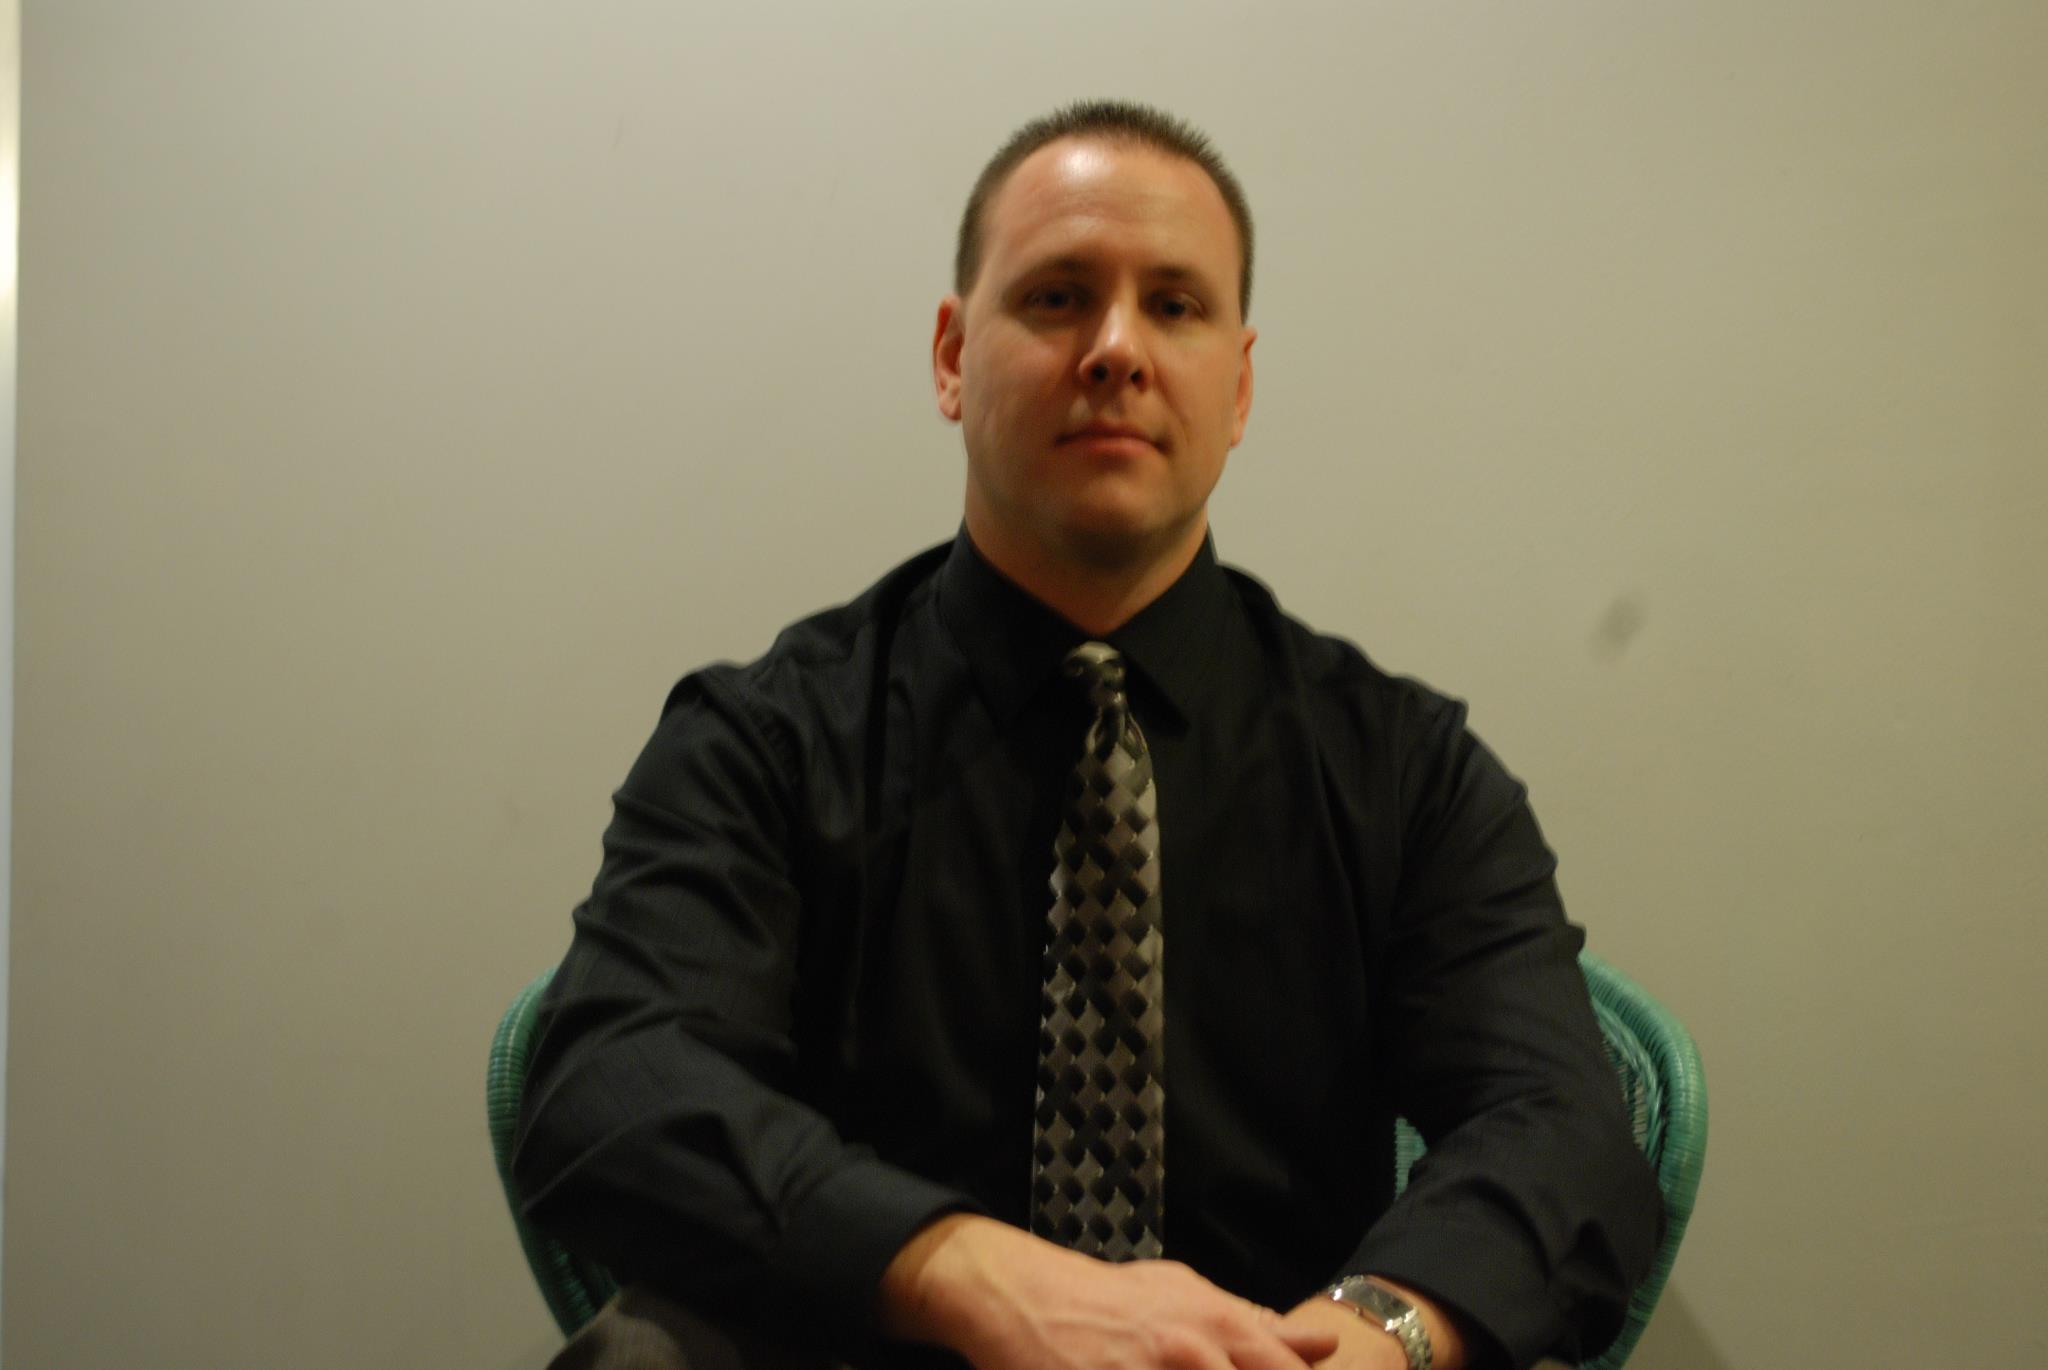 Jason Kropidlowski